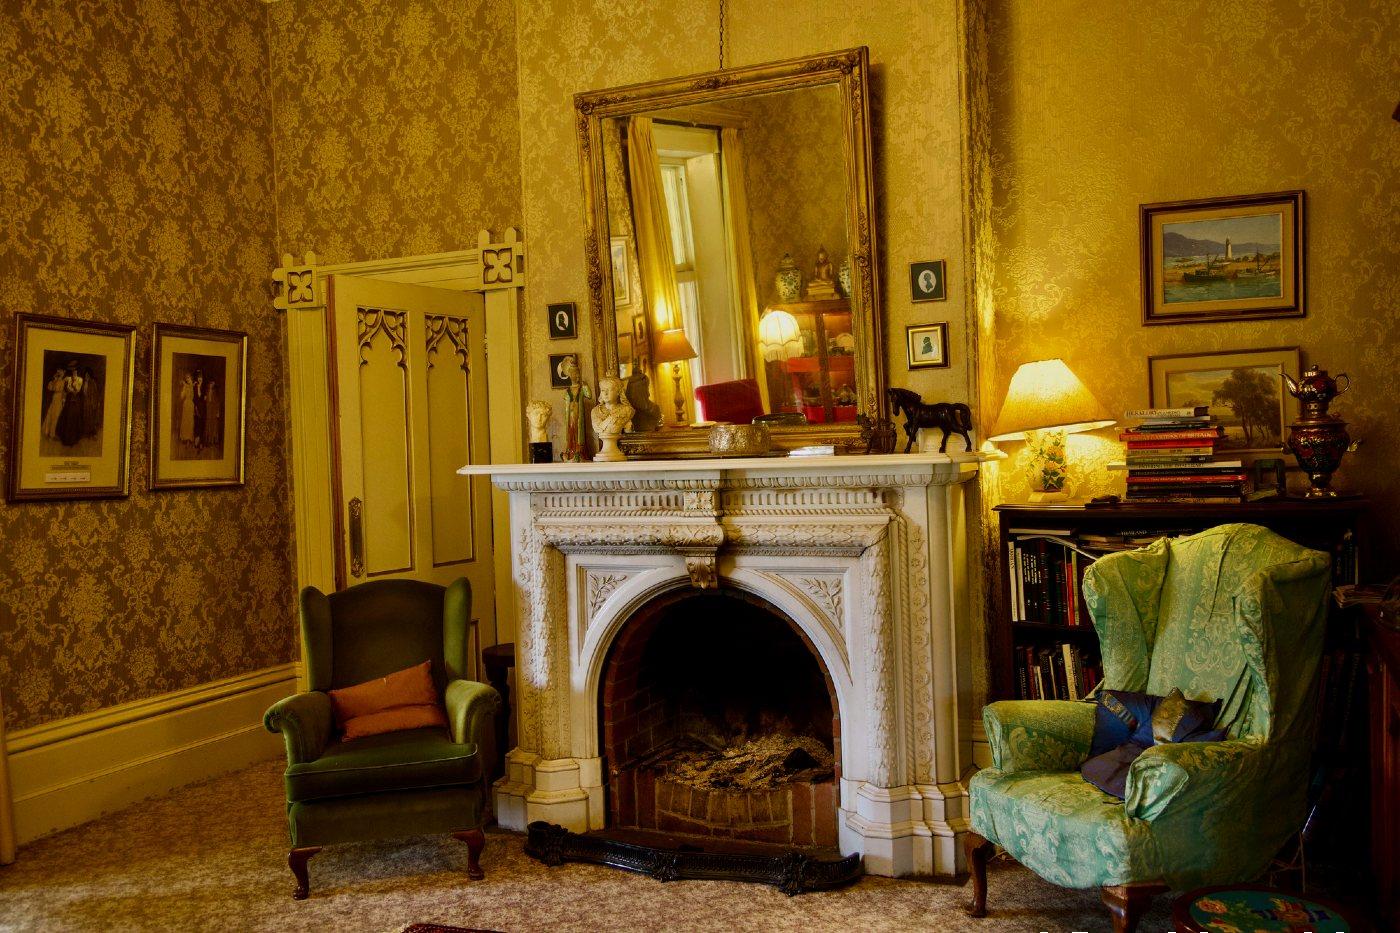 Abercrombie House Bathurst NSW Fireplaces